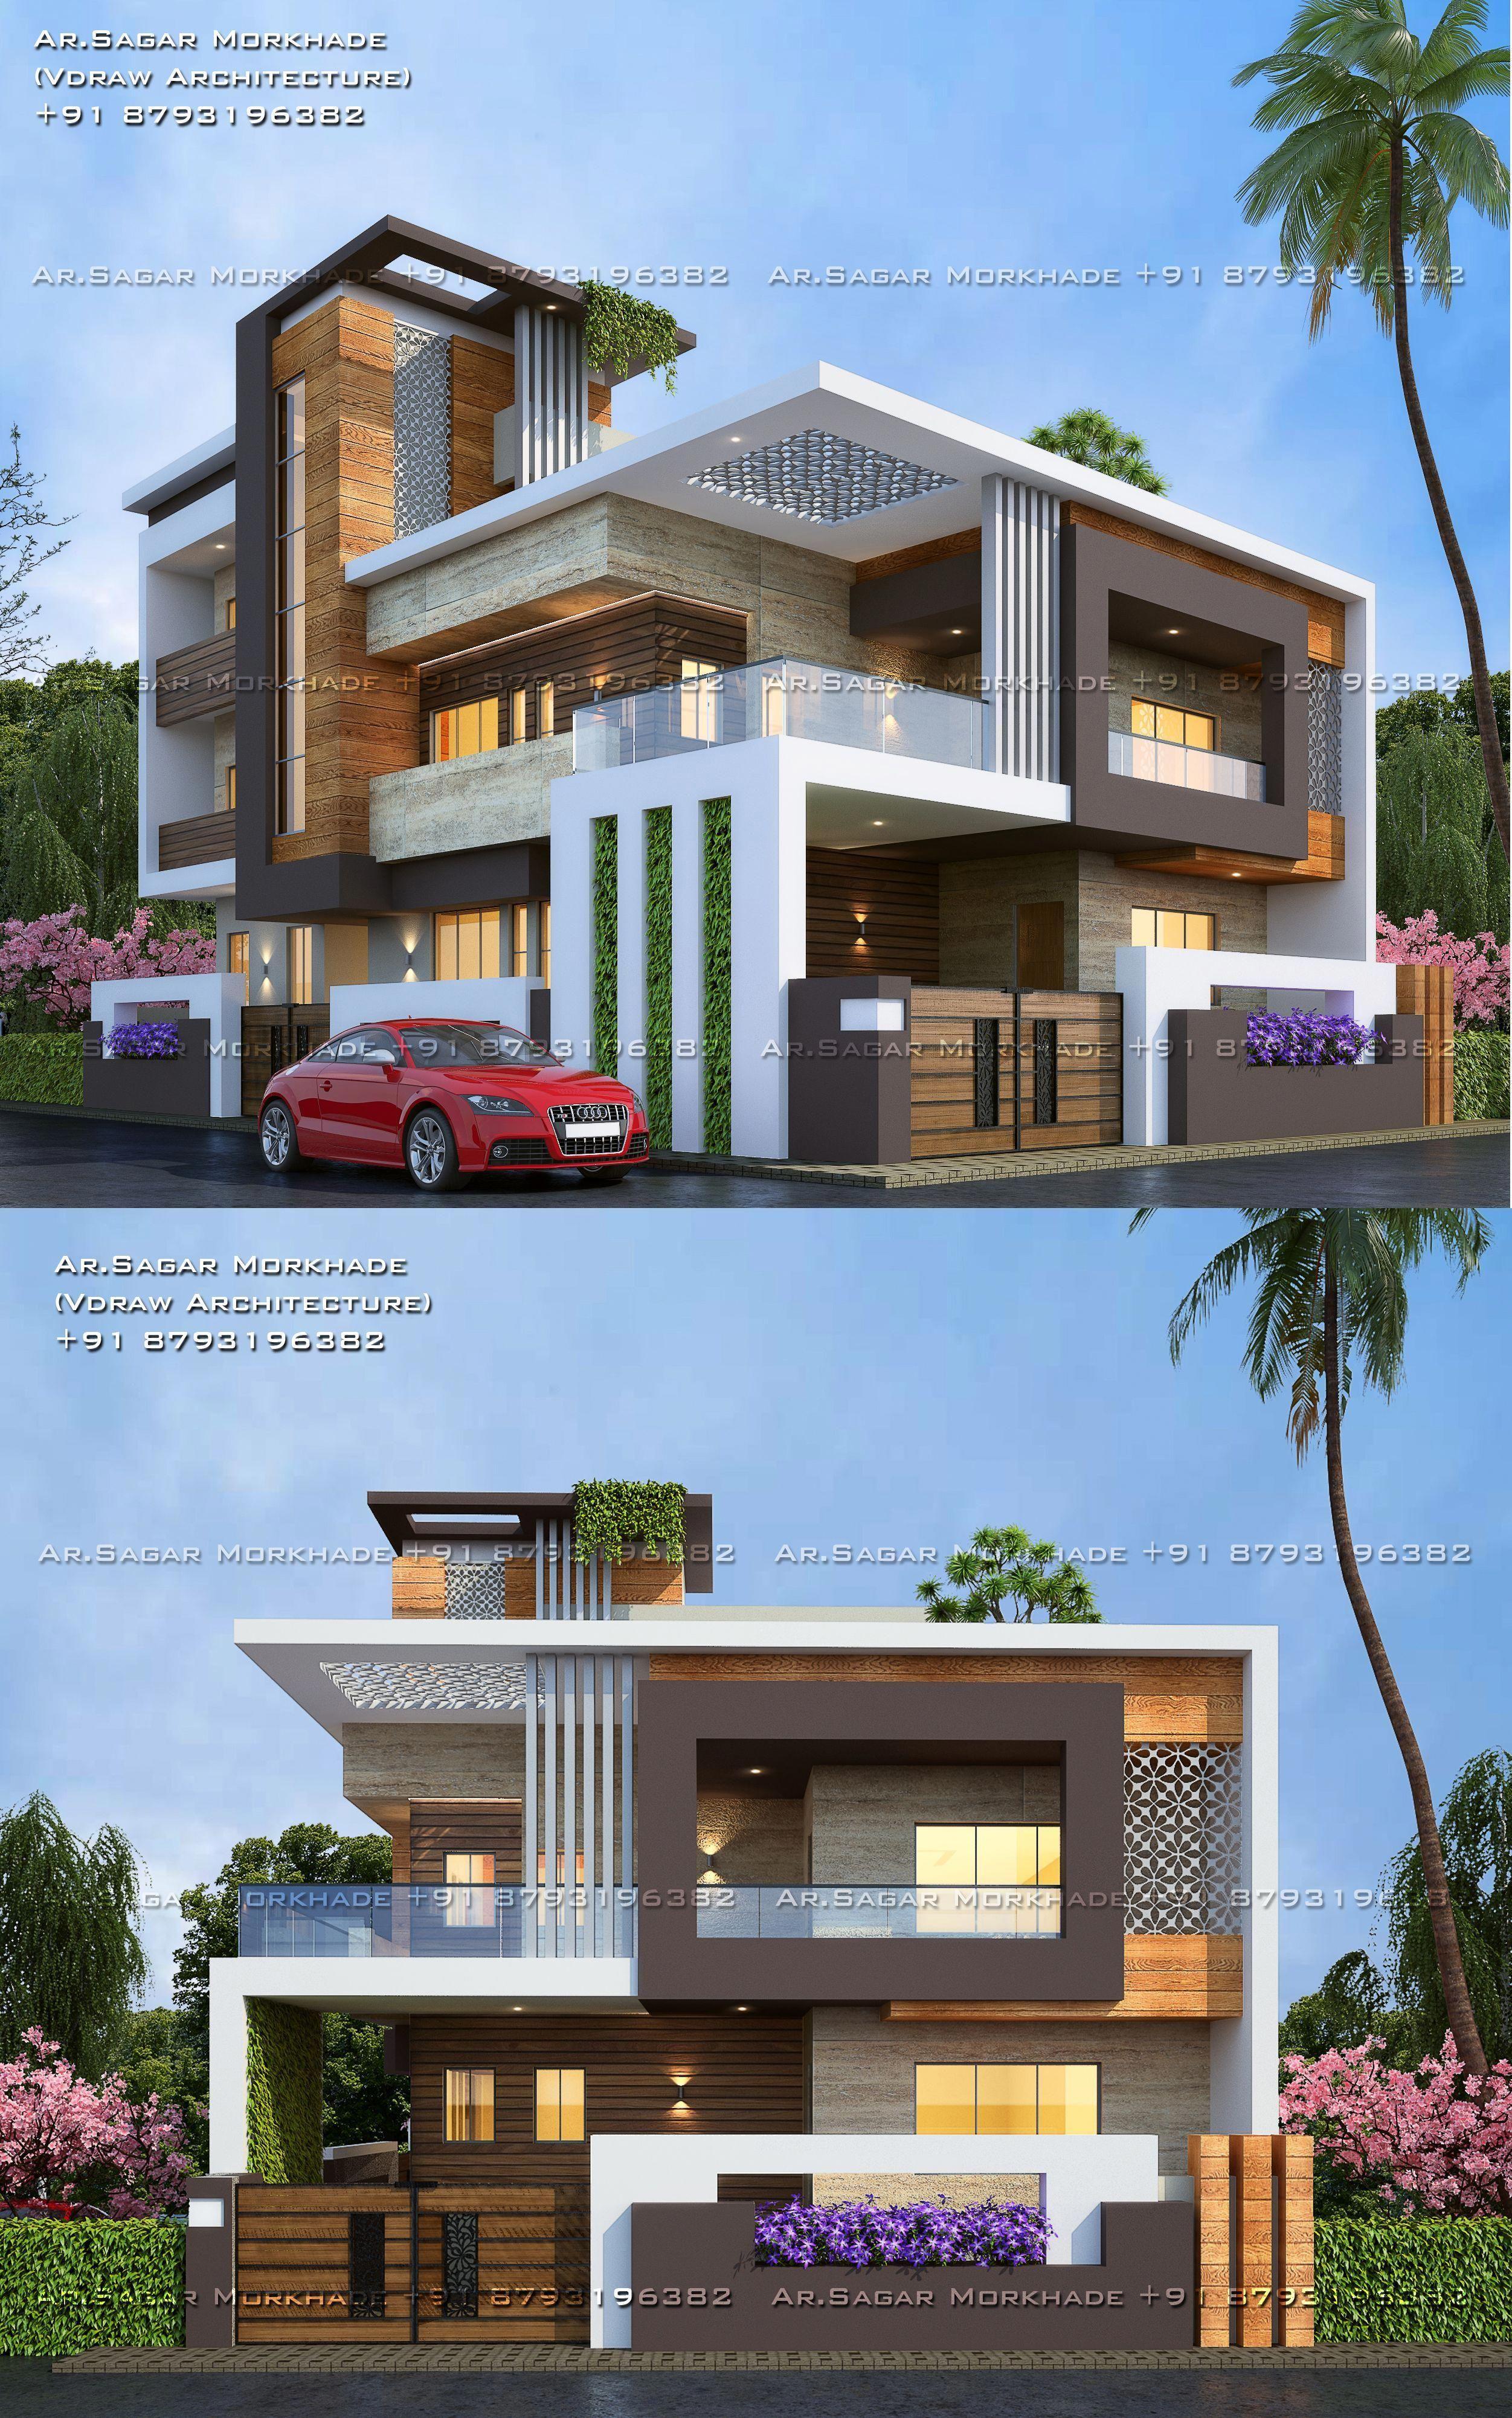 ғᴀɴᴄɪᴇsᴛ ᴀʀᴄʜɪᴛᴇᴄᴛᴜʀᴇ On Instagram How Do You Like This Home S Design Comment Below Is Thi Modern House Facades House Front Design Bungalow Exterior